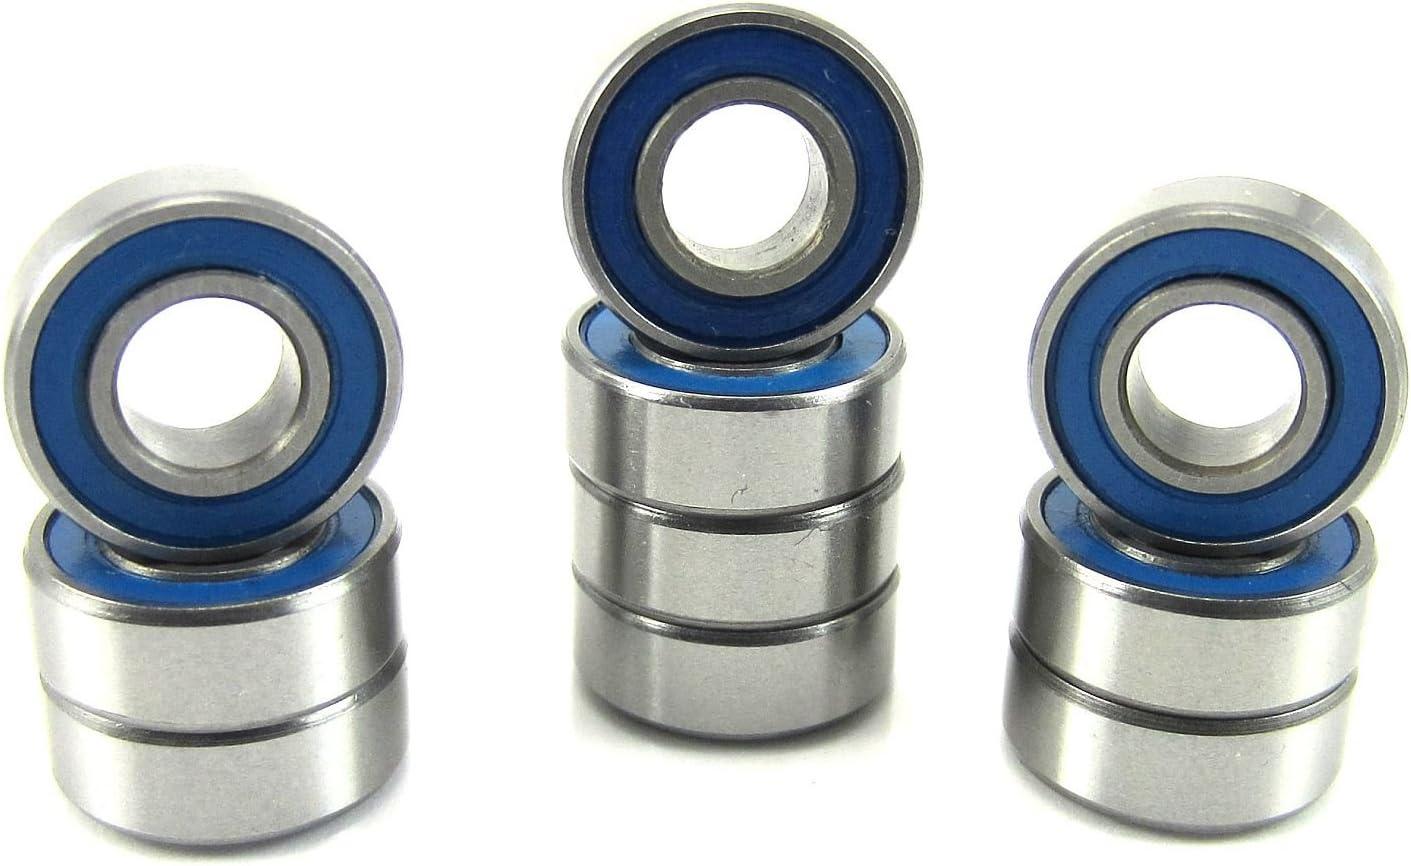 Traxxas 5116 5x11x4mm Replacement Precision Ball Bearings MR115-2RSBU (10)